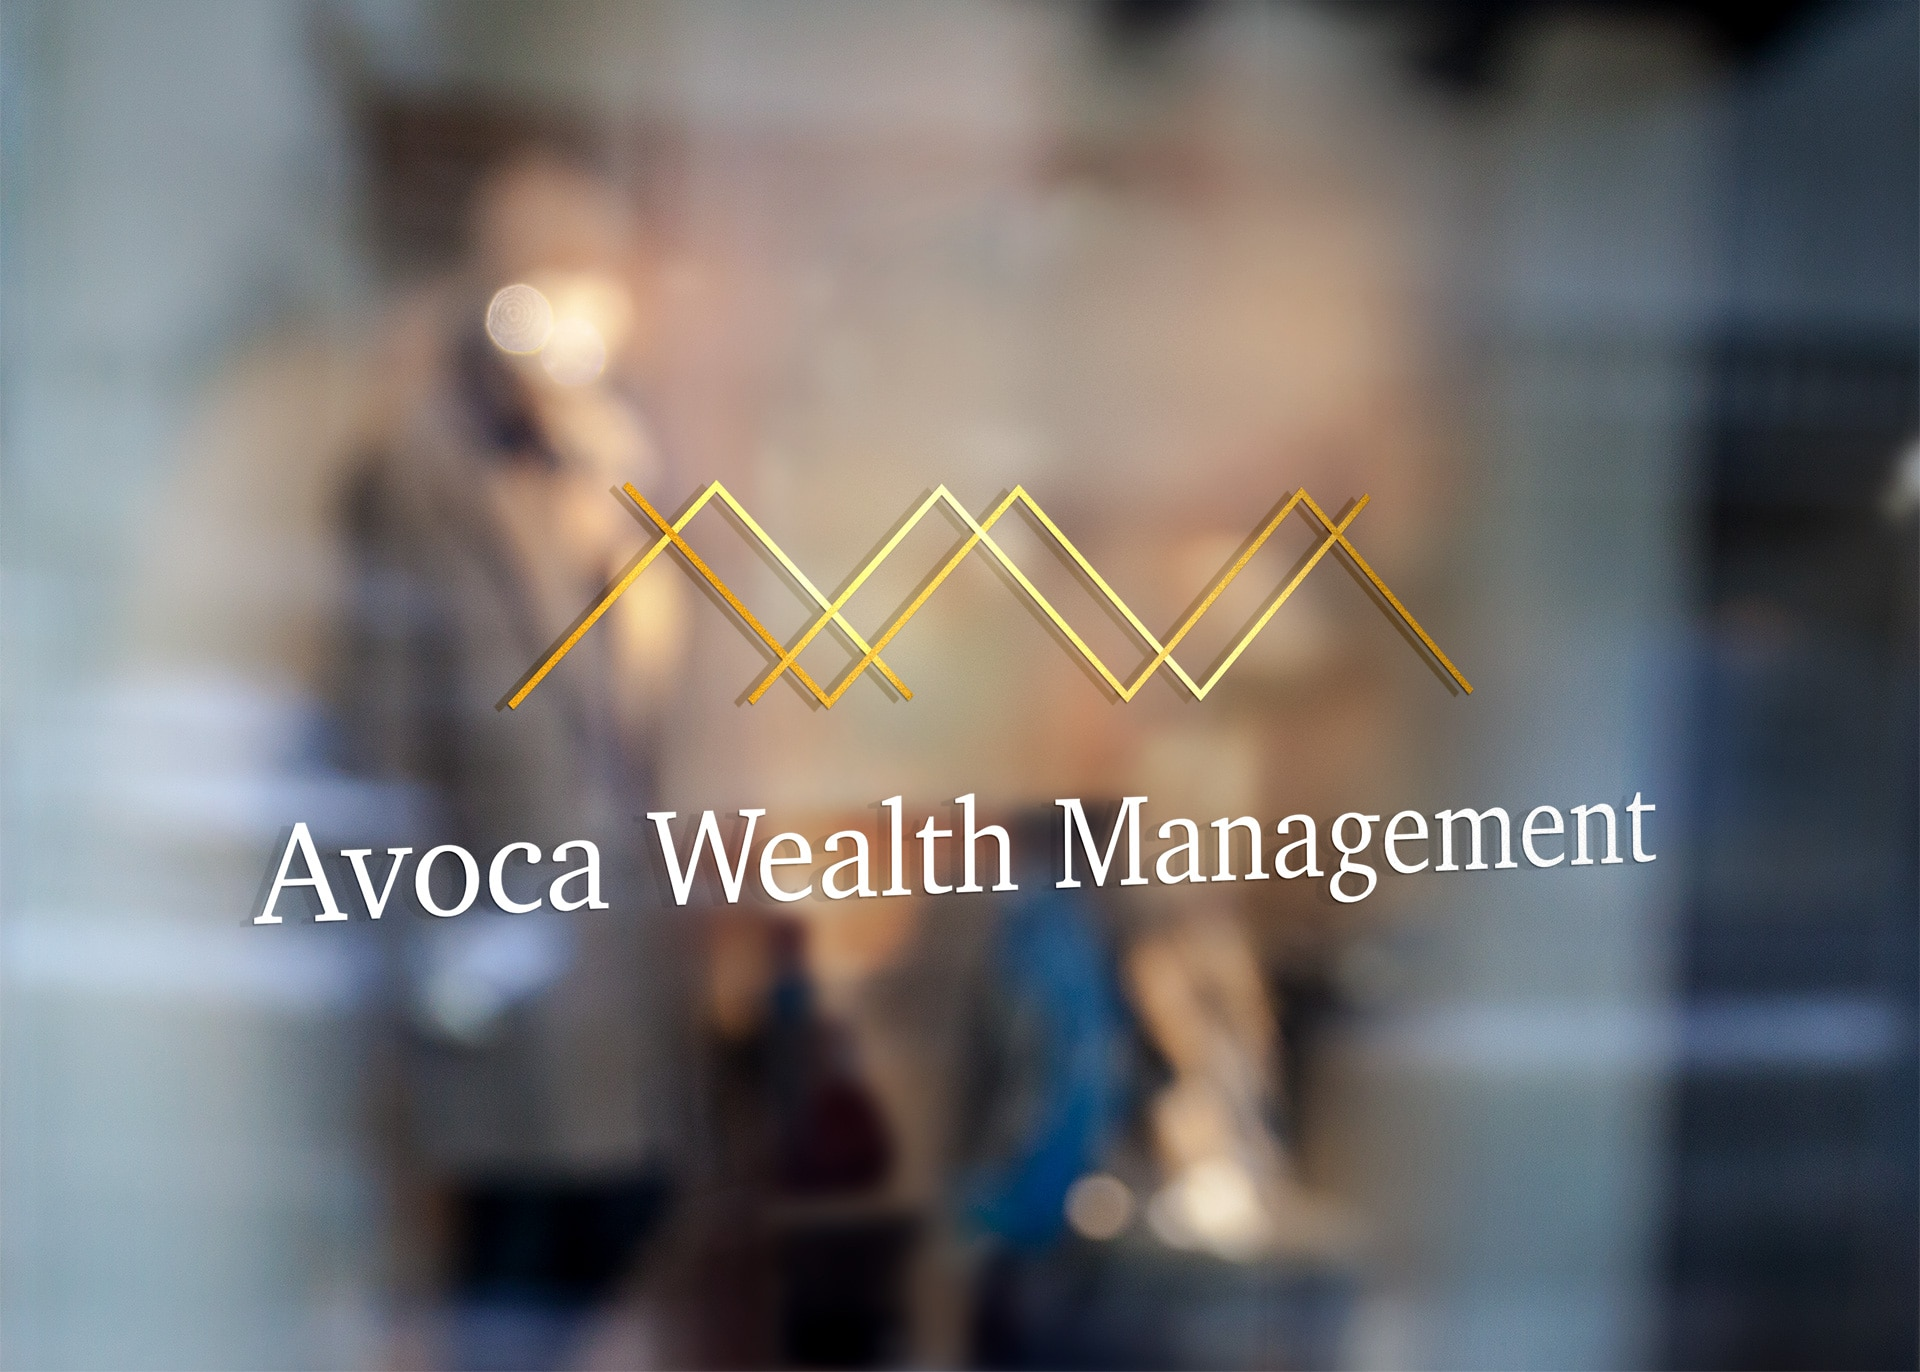 AVOCA_Window_Signage_MockUp_2